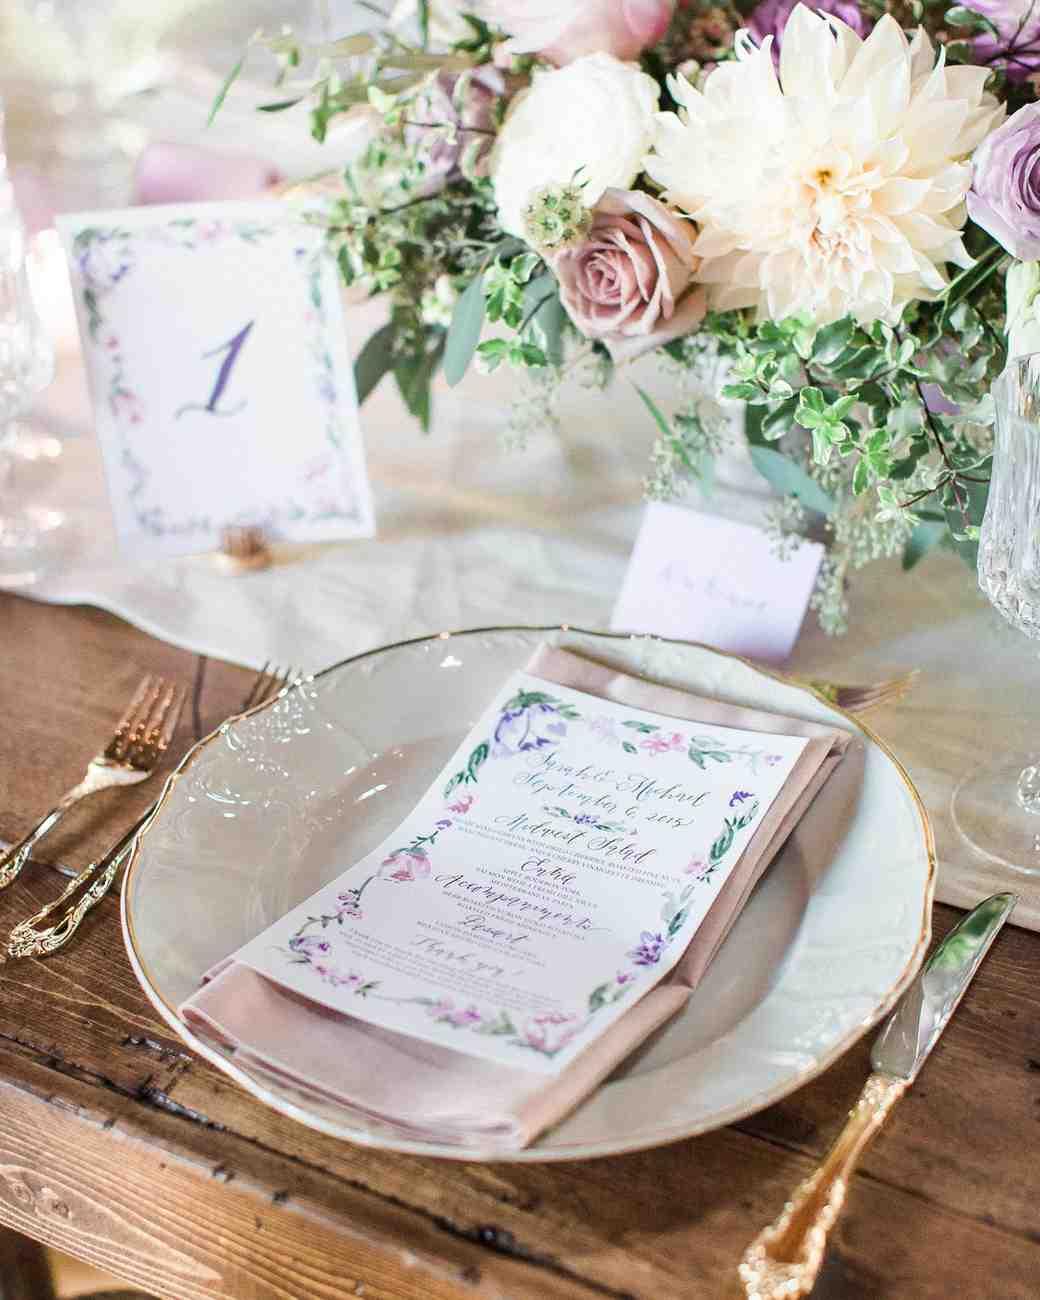 sarah-michael-wedding-placesetting-796-s112783-0416.jpg